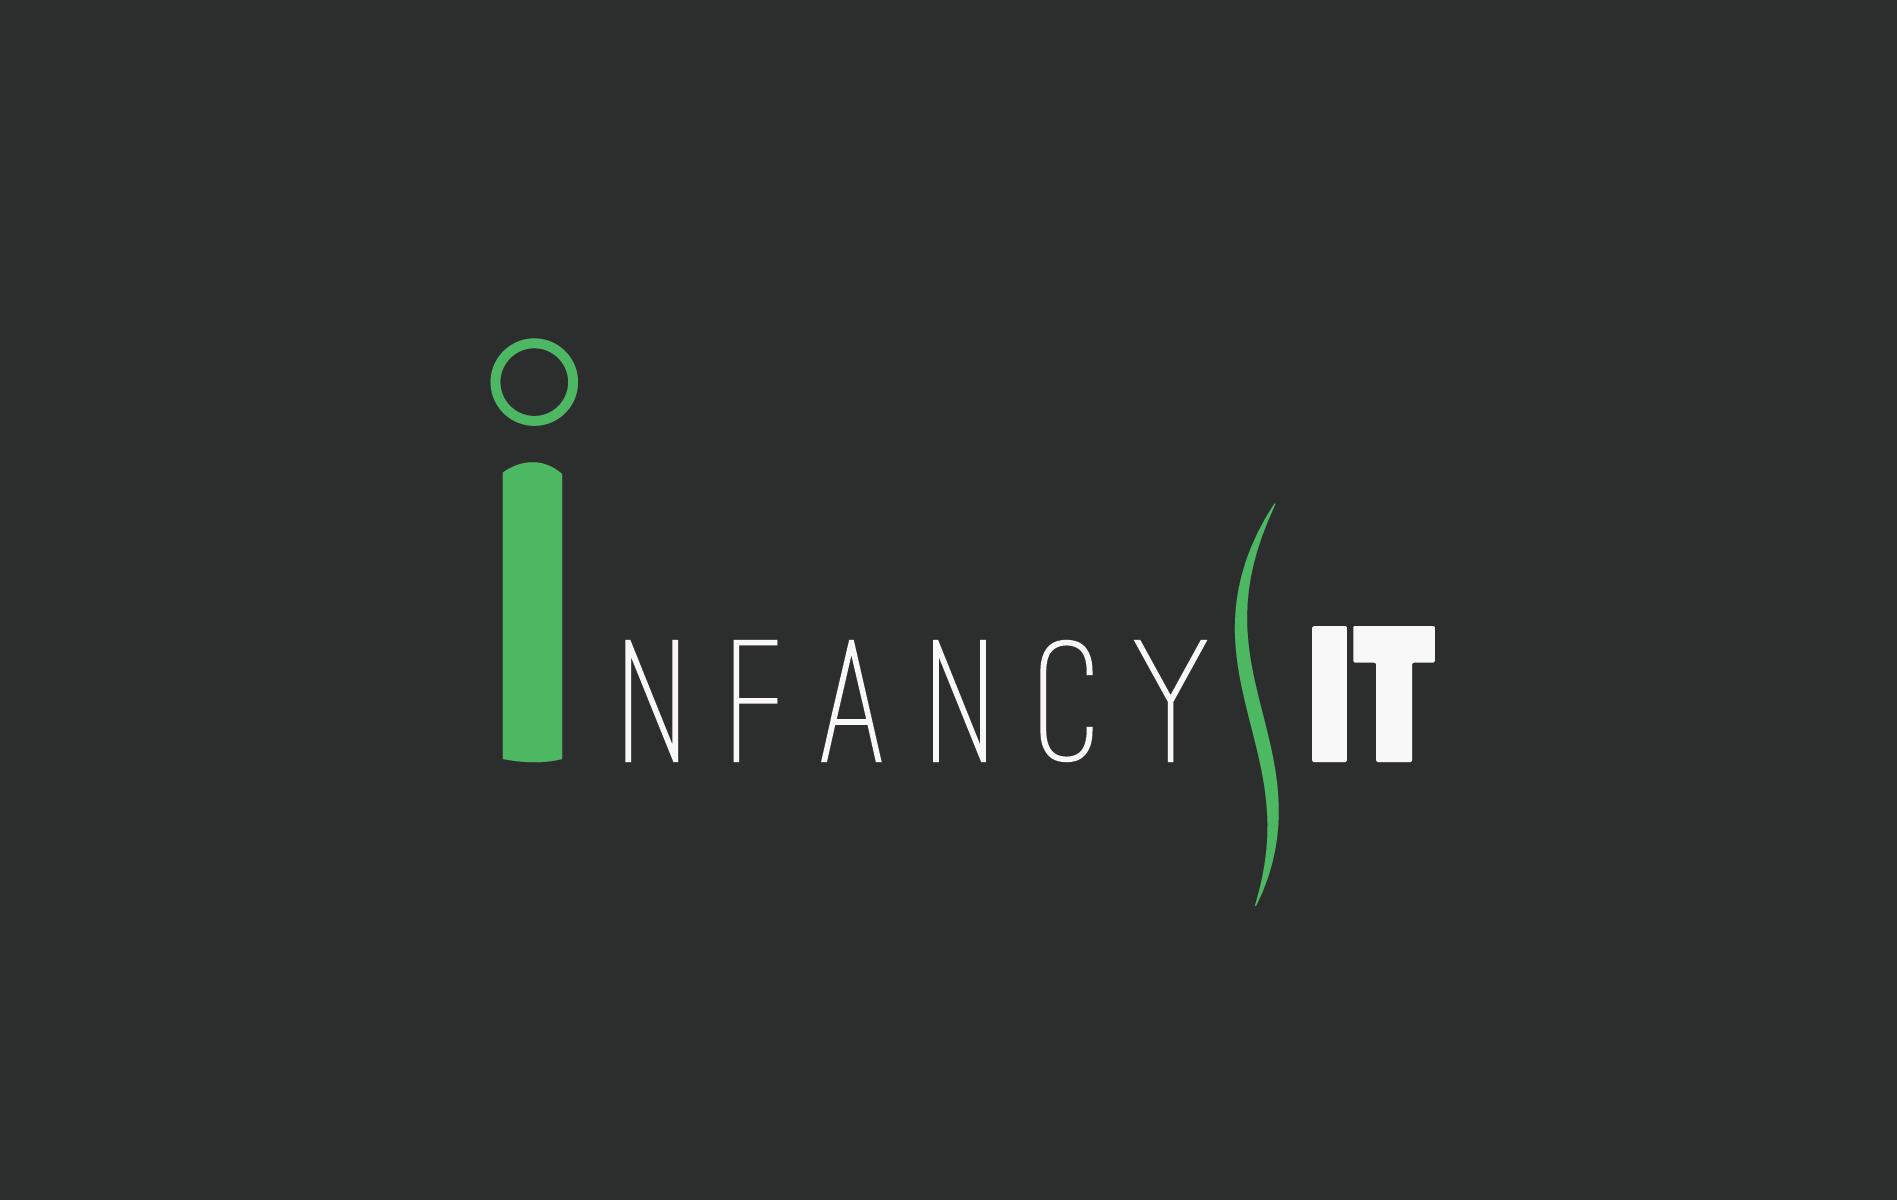 InfancyIT